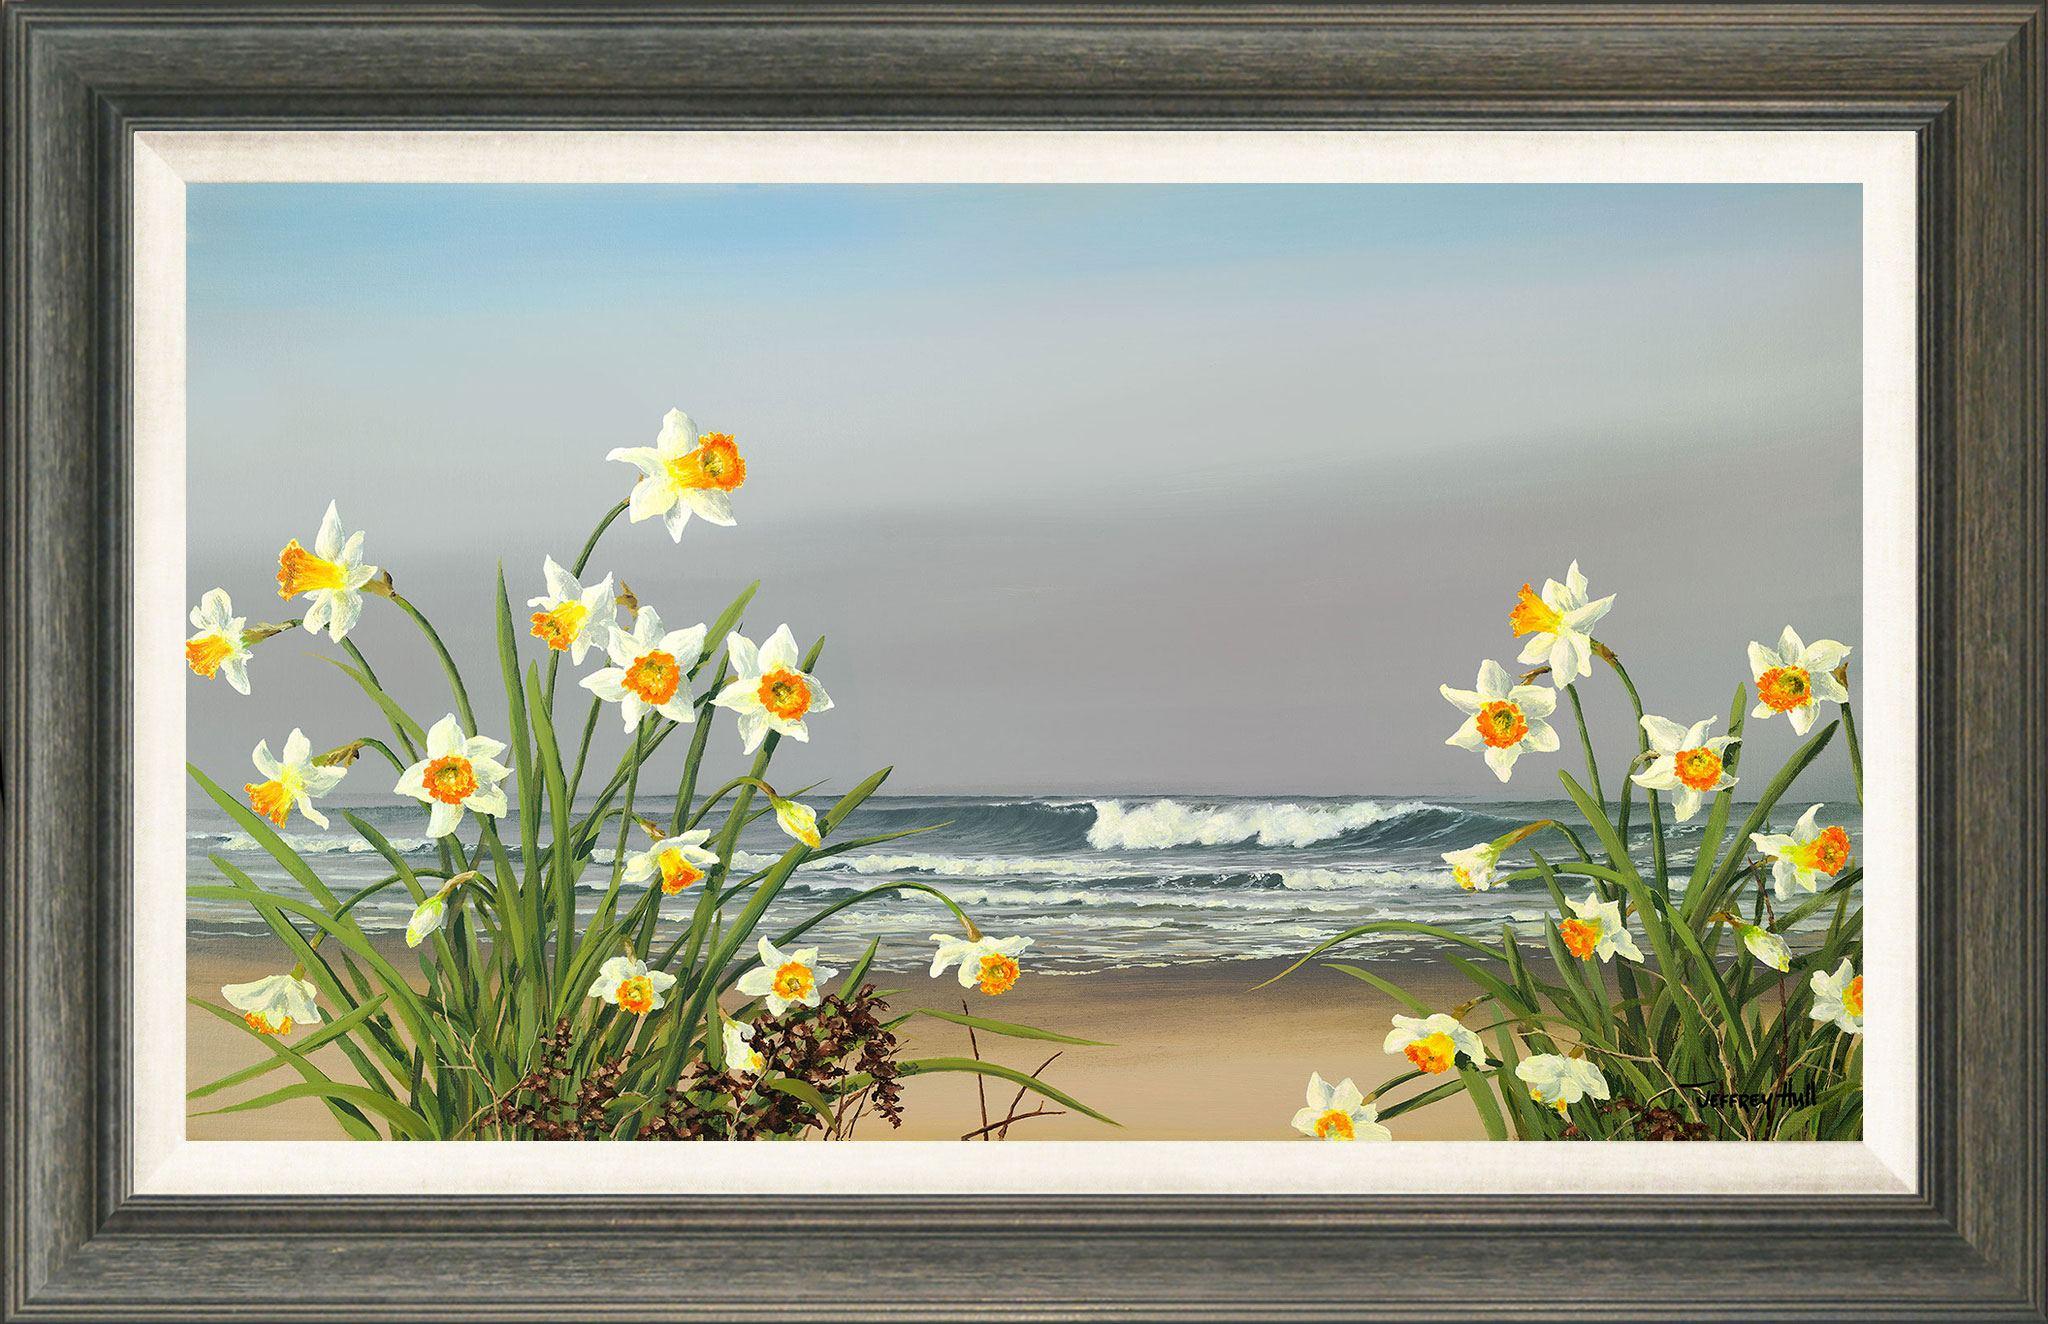 Shoreline-Daffodils-OpenEd-Cascade-White-Liner-4-Website-2021